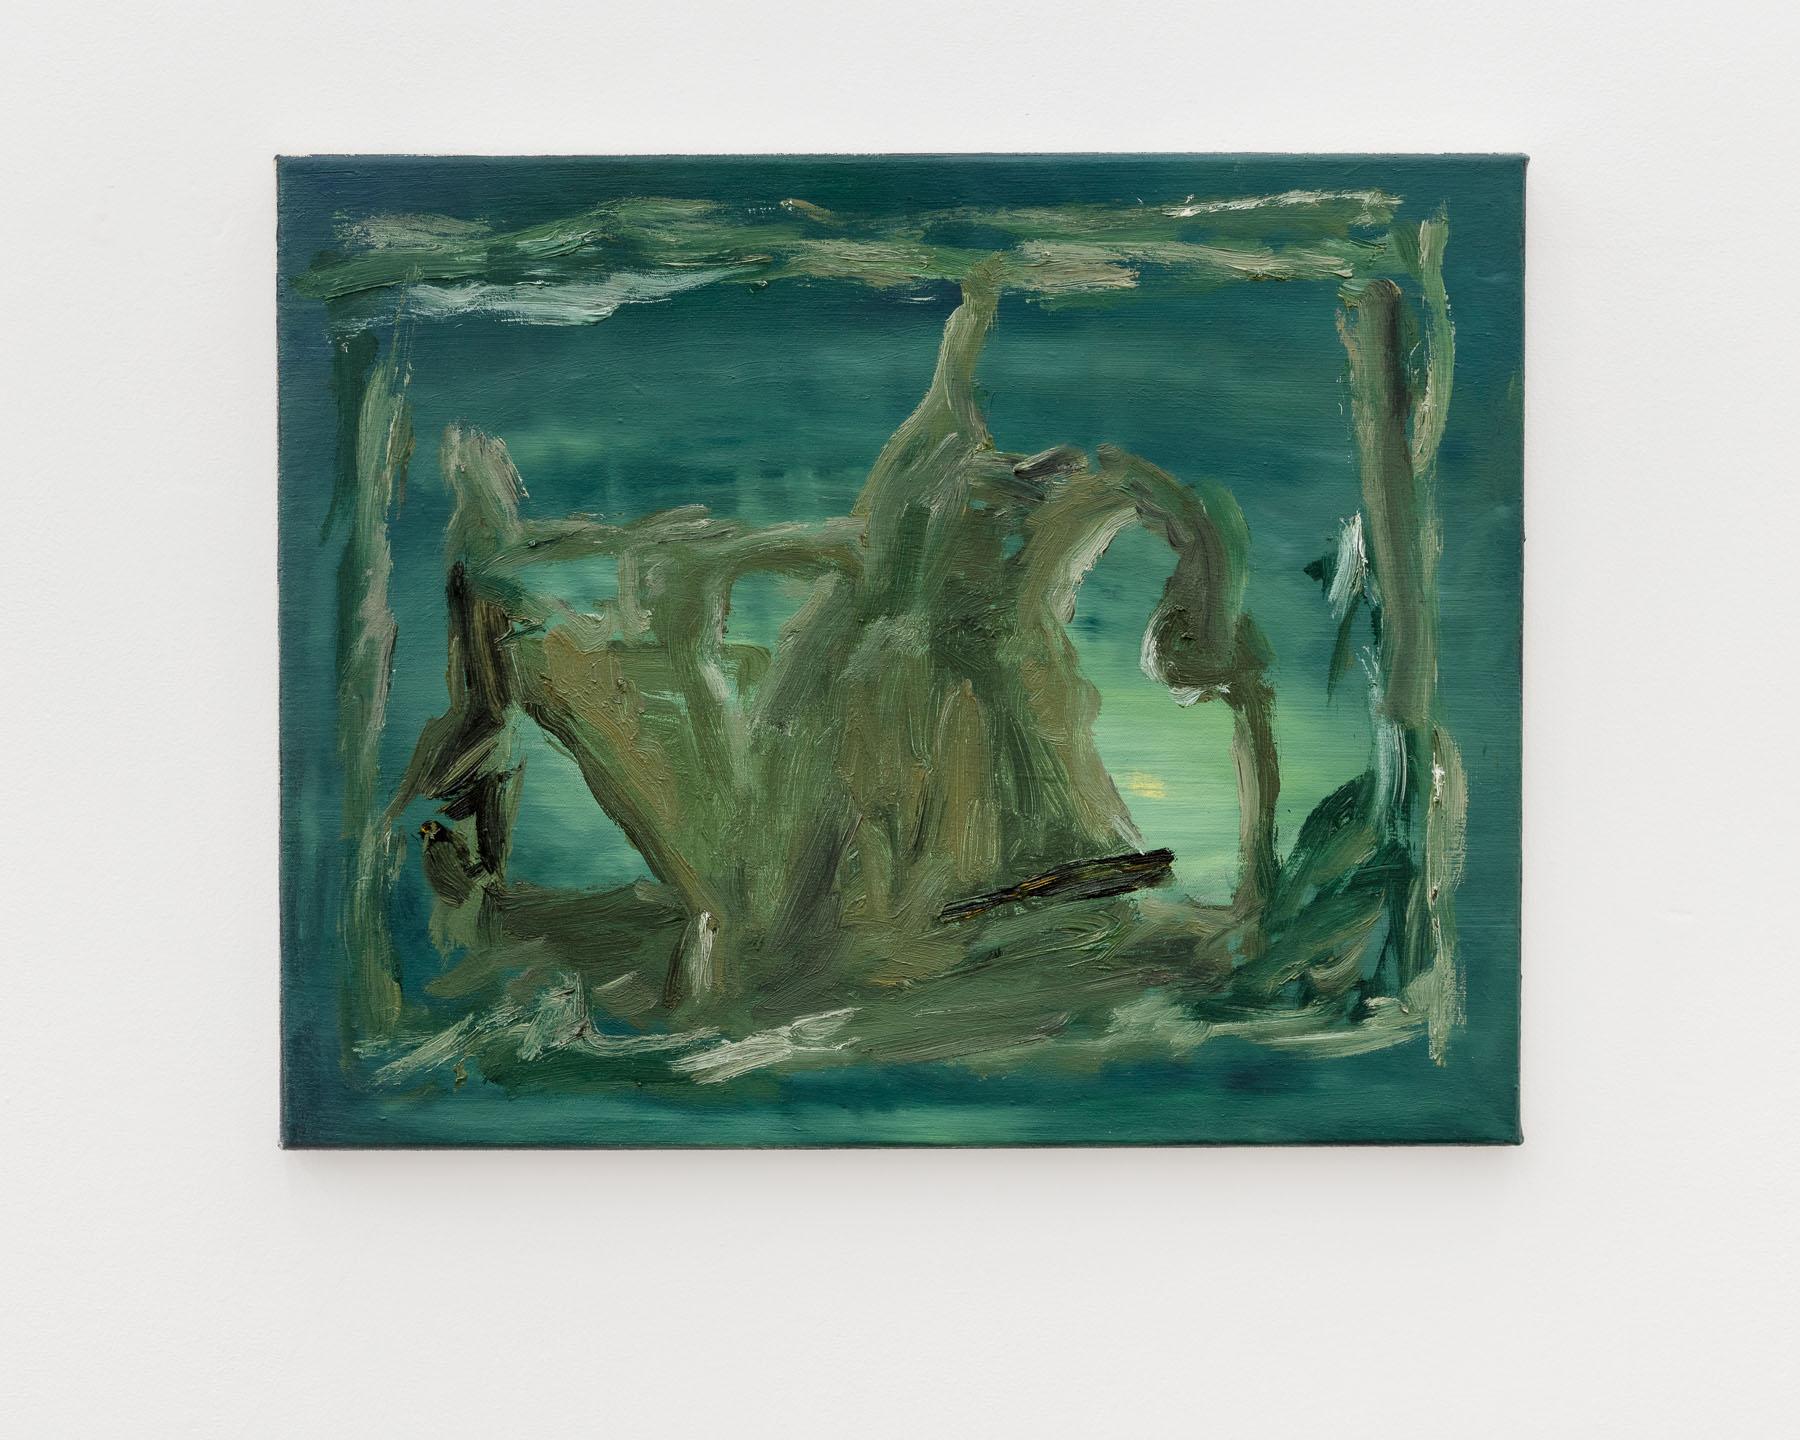 Veronika Hilger, untitled, 2016, oil on canvas, 40 x 50 cm